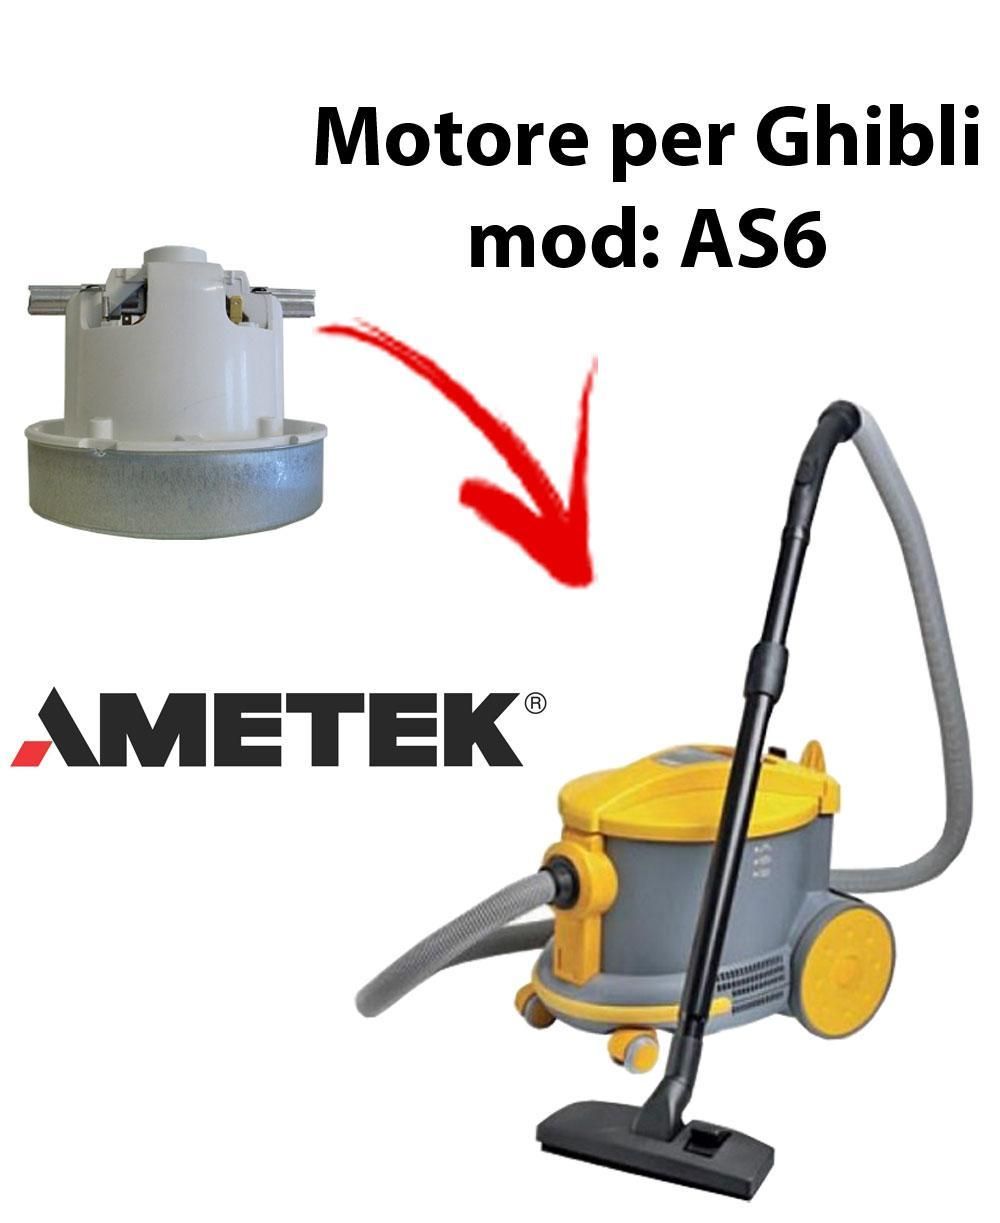 AS6  Motore de aspiración AMETEK para aspiradora GHIBLI